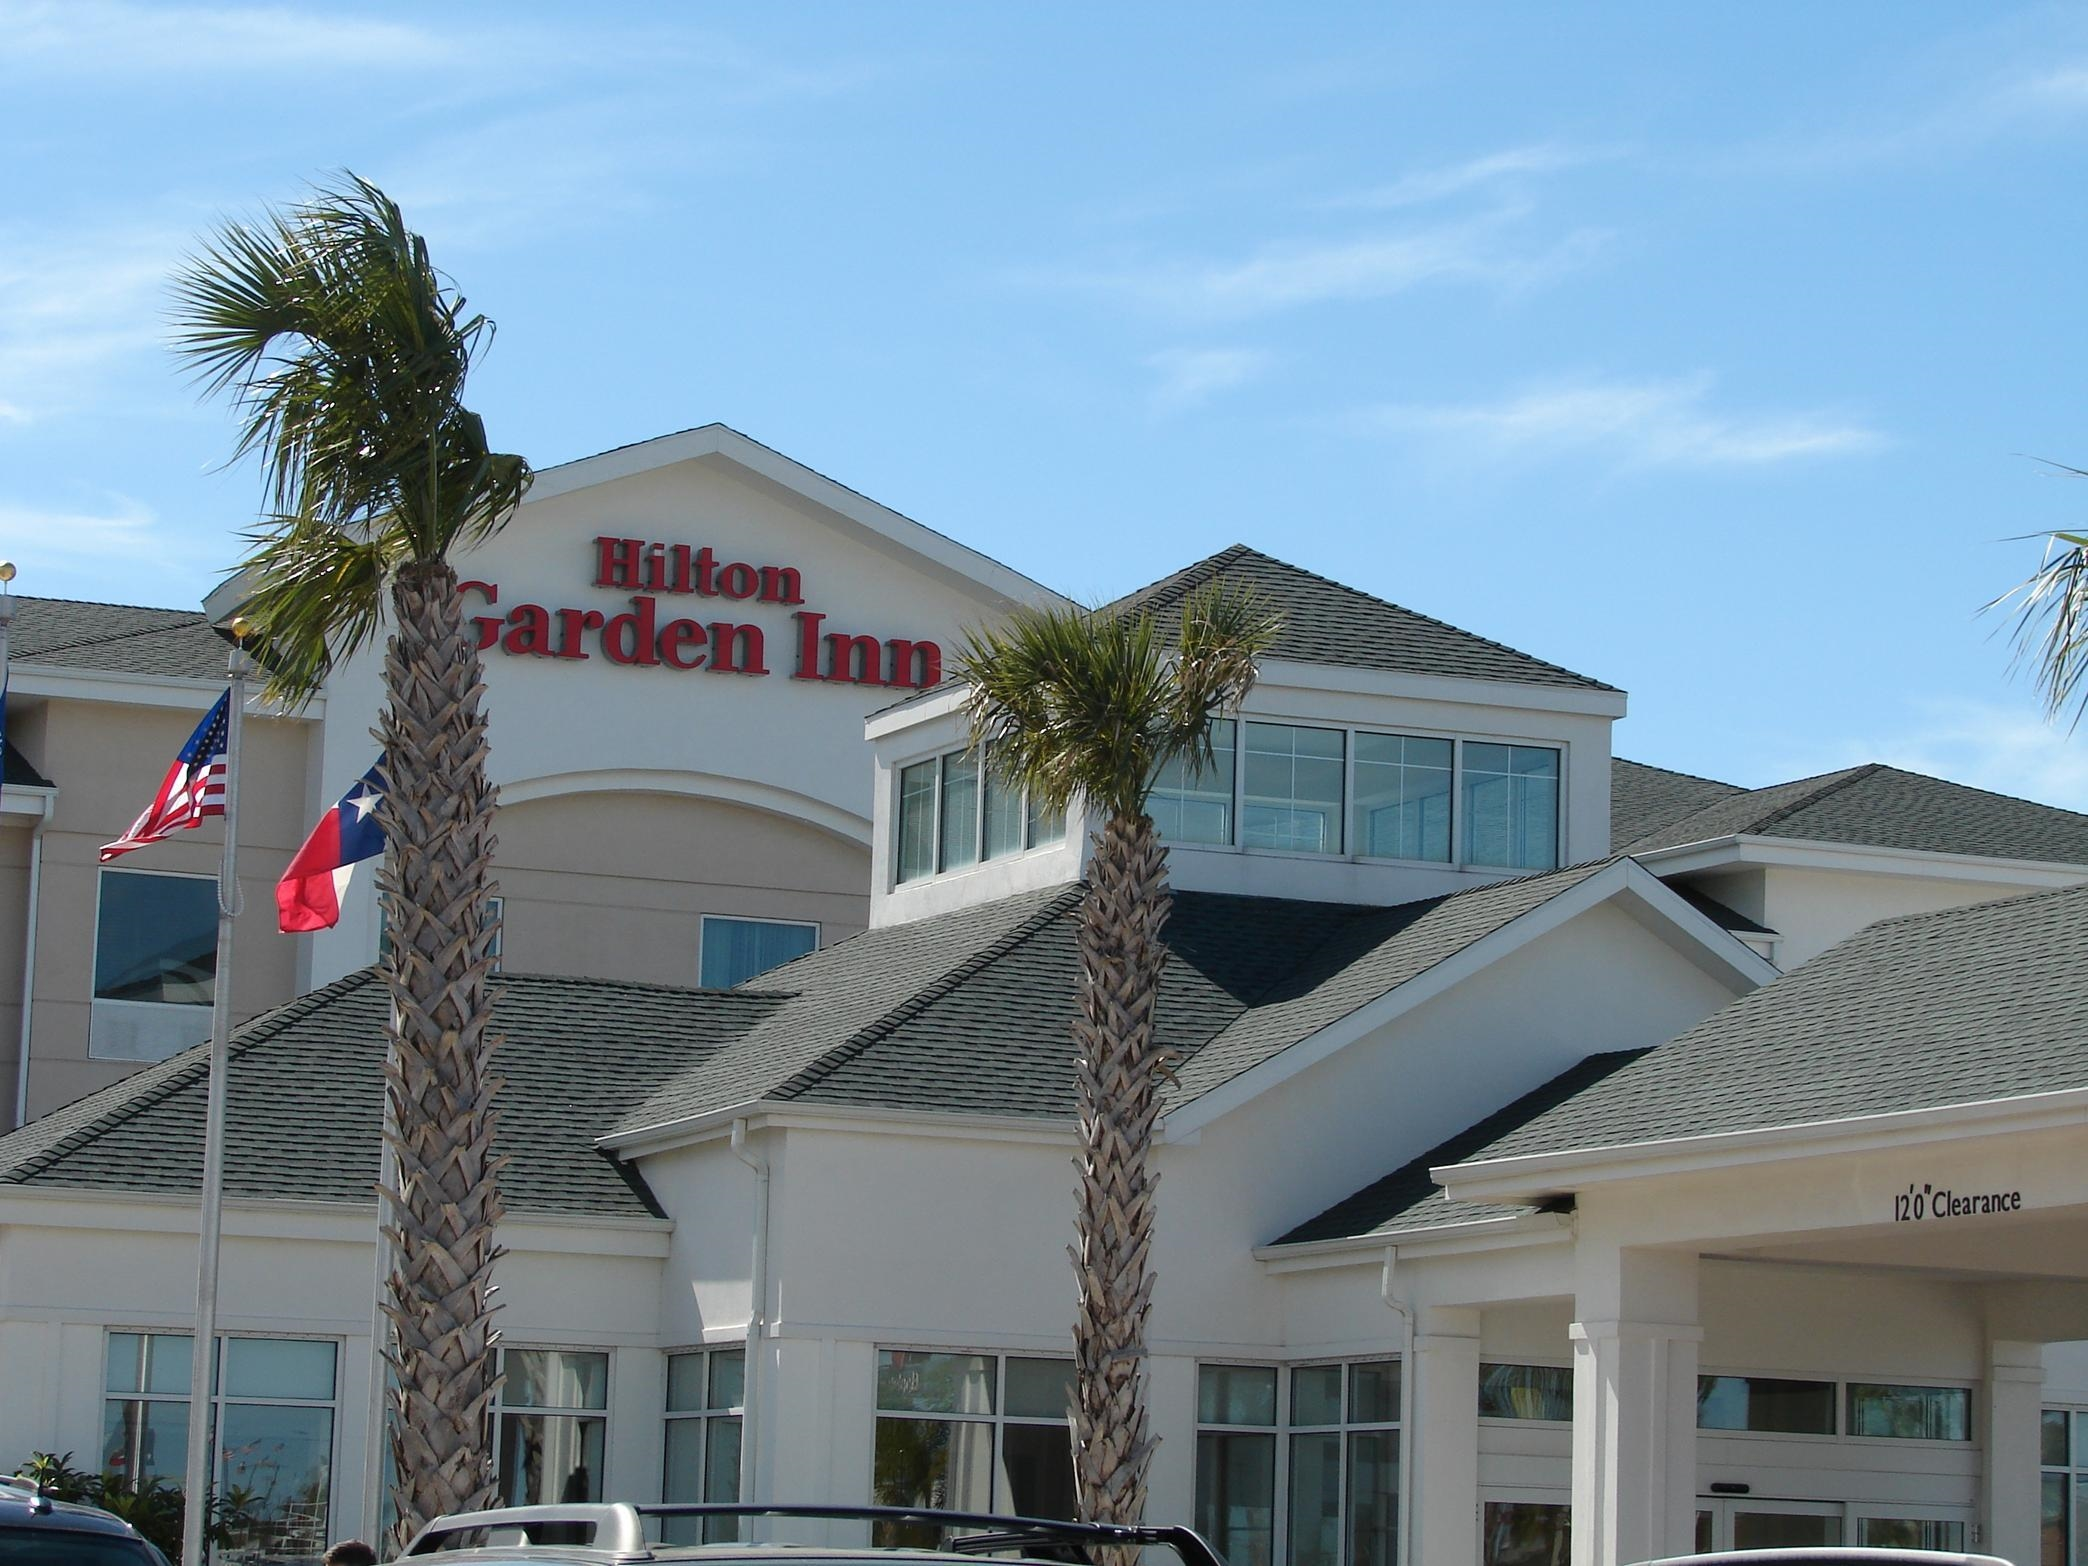 Hilton Garden Inn Corpus Christi At 6717 South Padre Island Drive Corpus Christi Tx On Fave